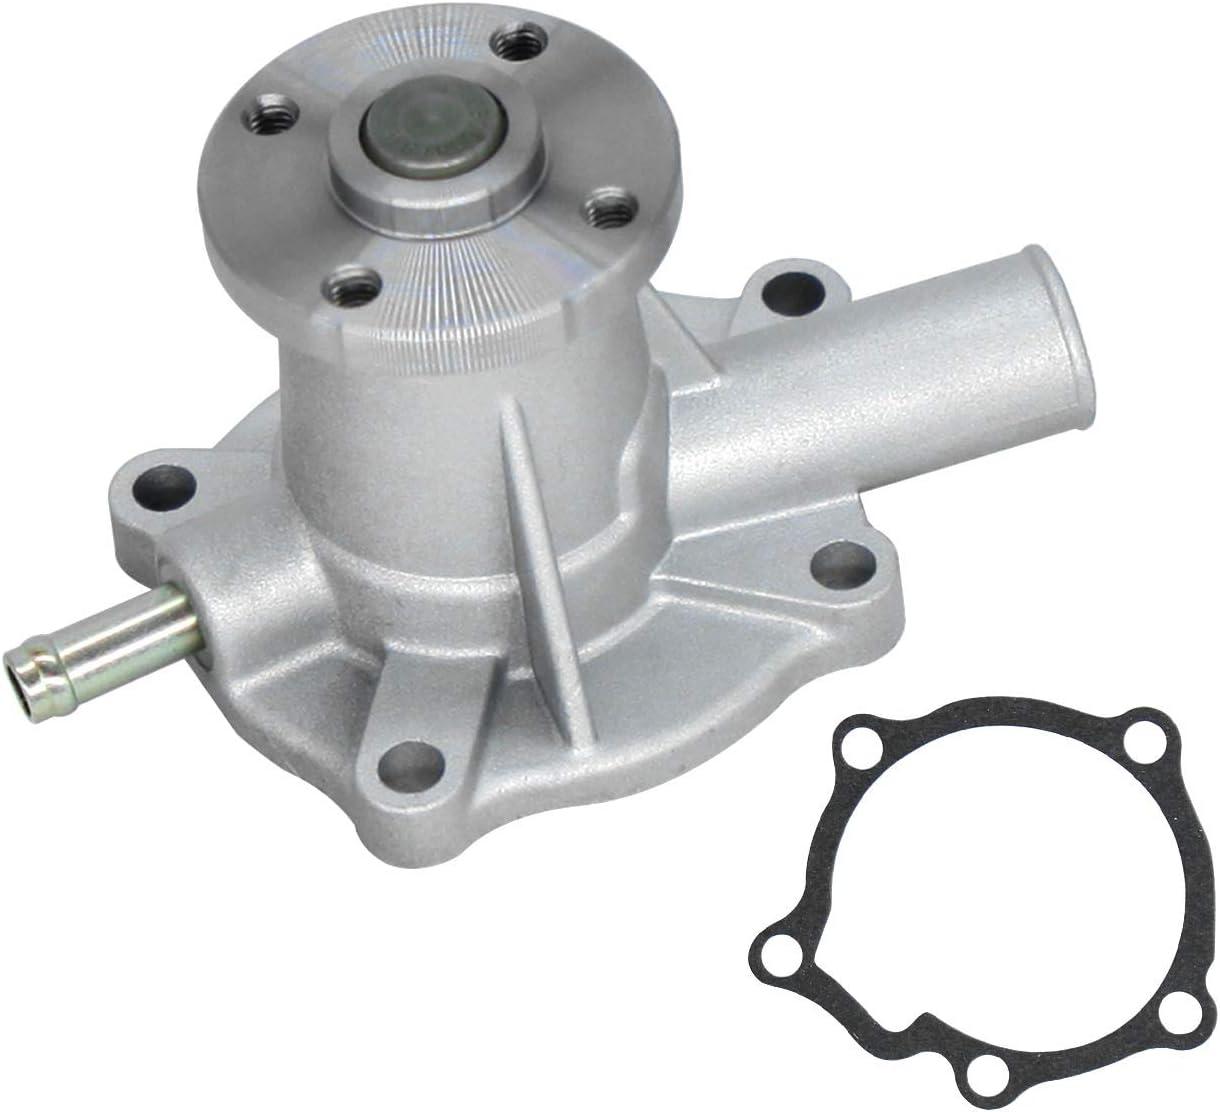 Notonmek 15852-73030 1G820-73030 Water Pump Trac New mail order for Cheap sale Lawn Kubota